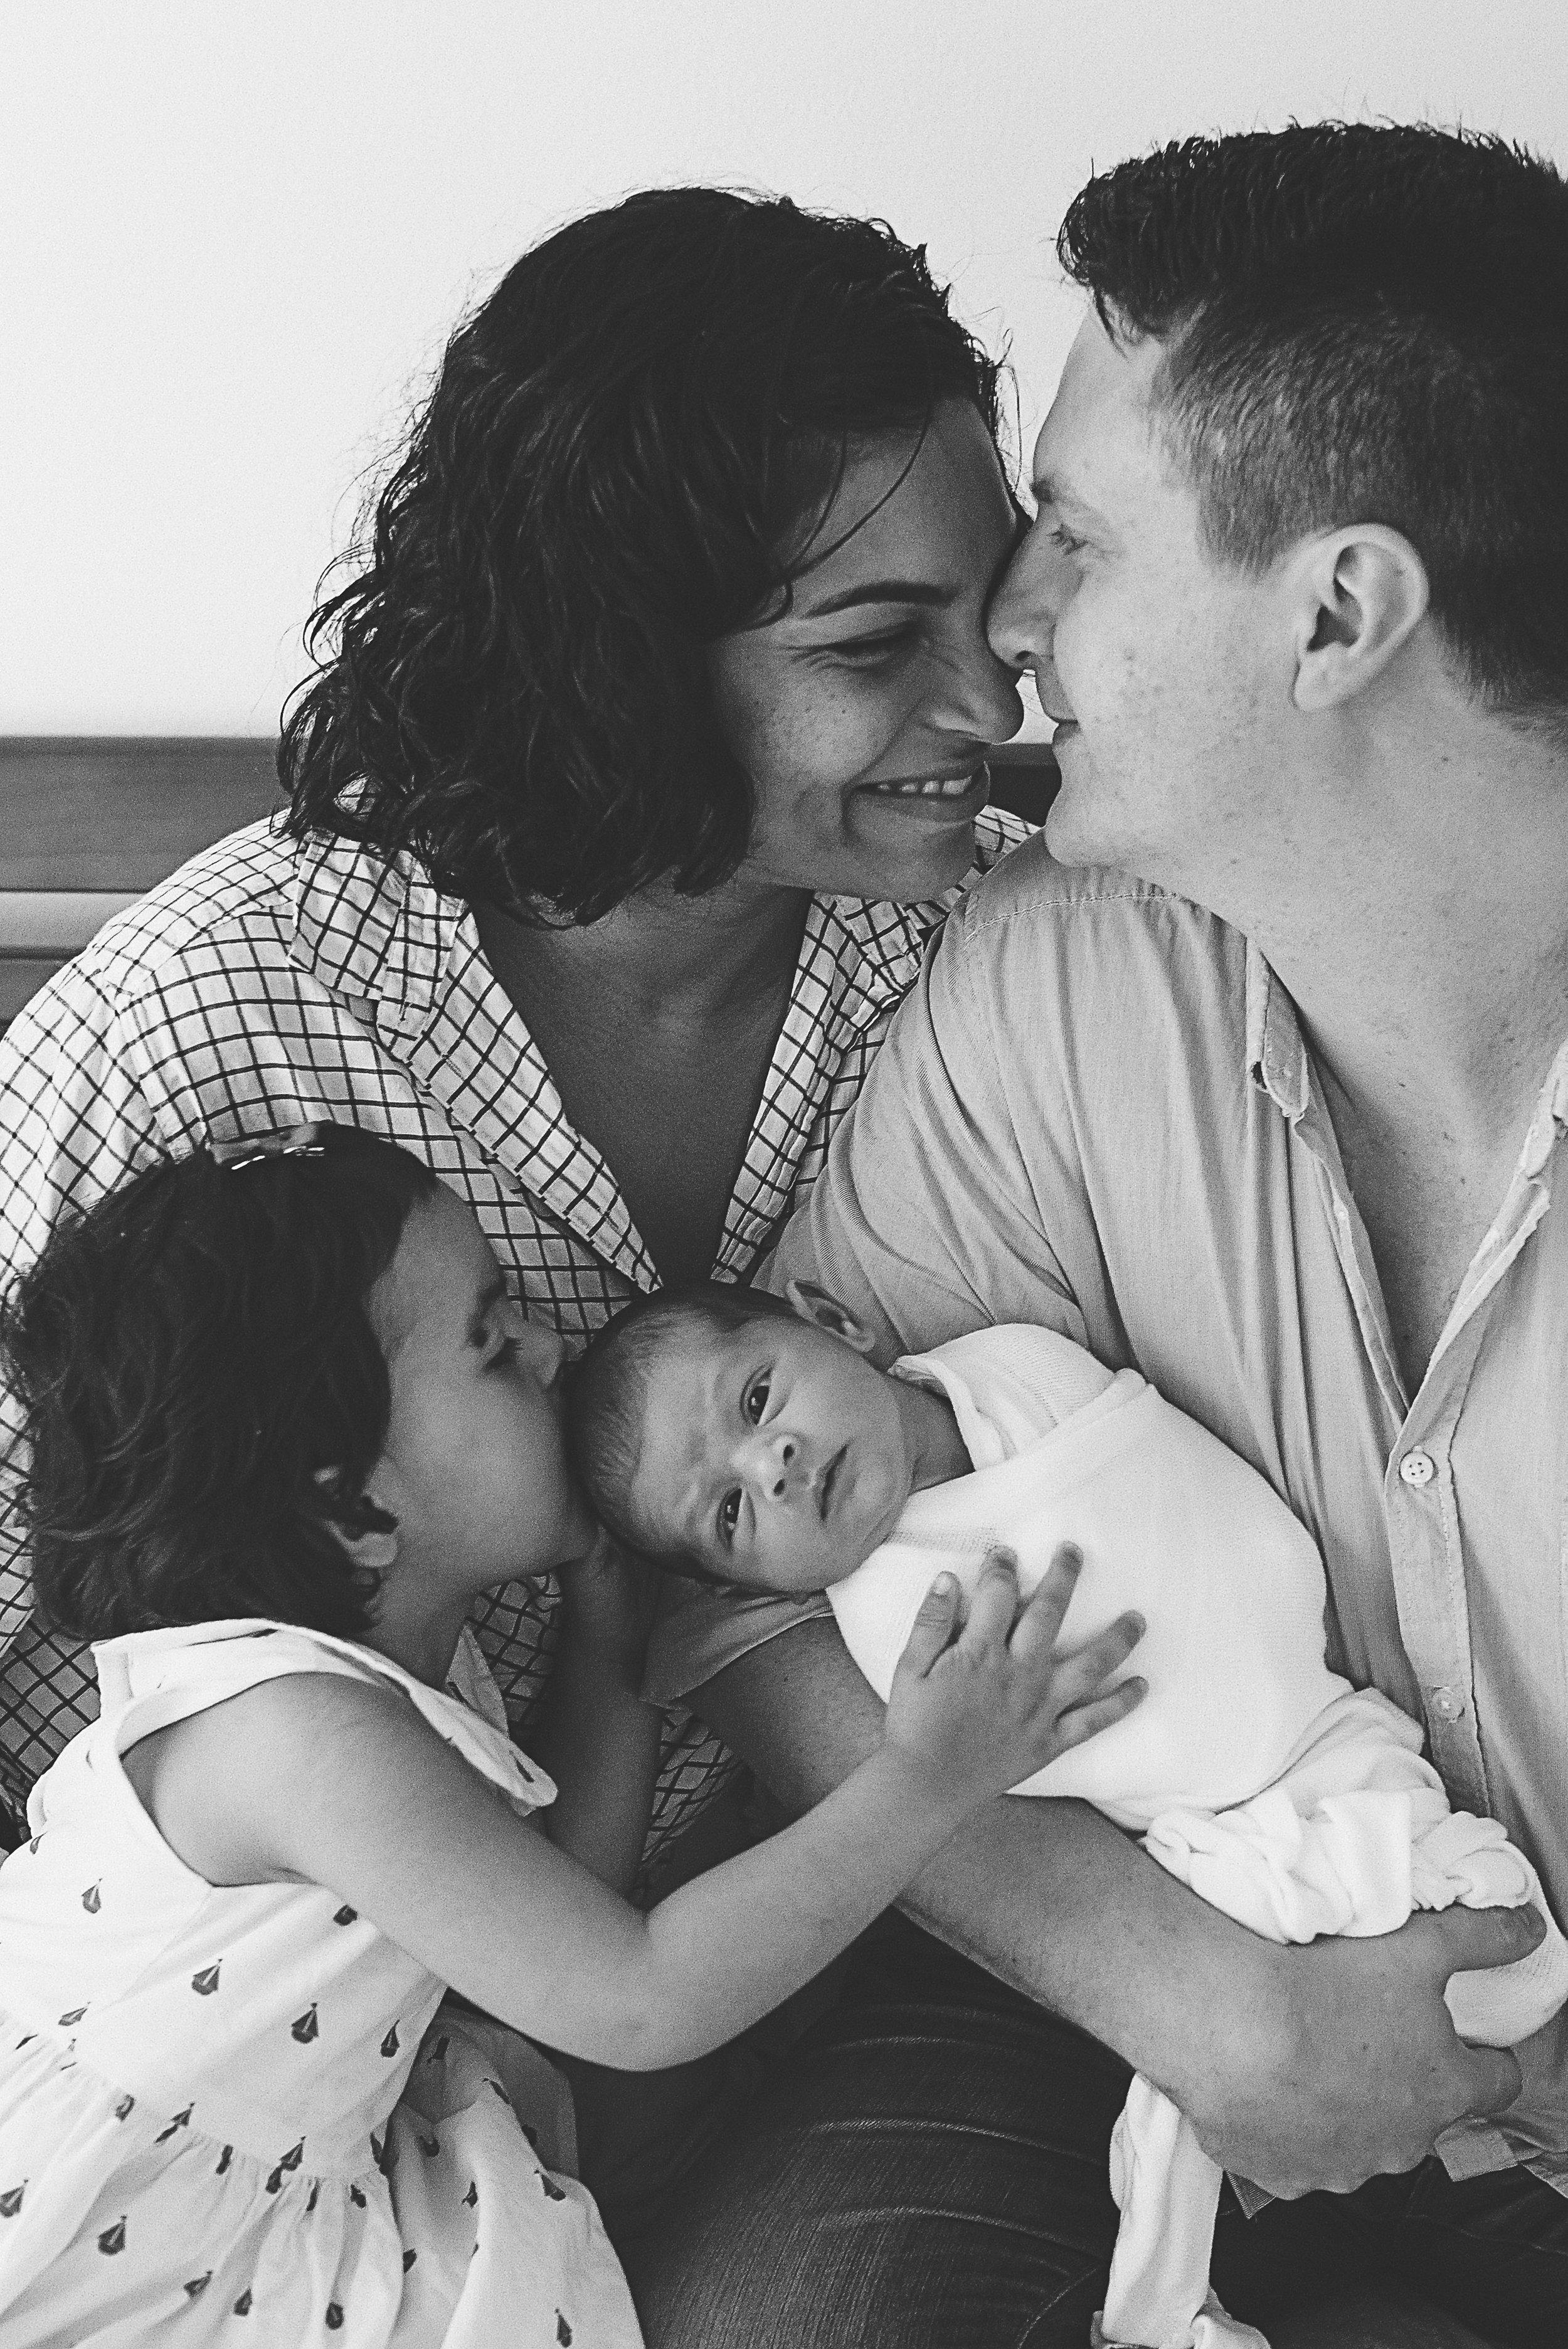 006Sydney_Family_newborn_baby_photography-59.jpg